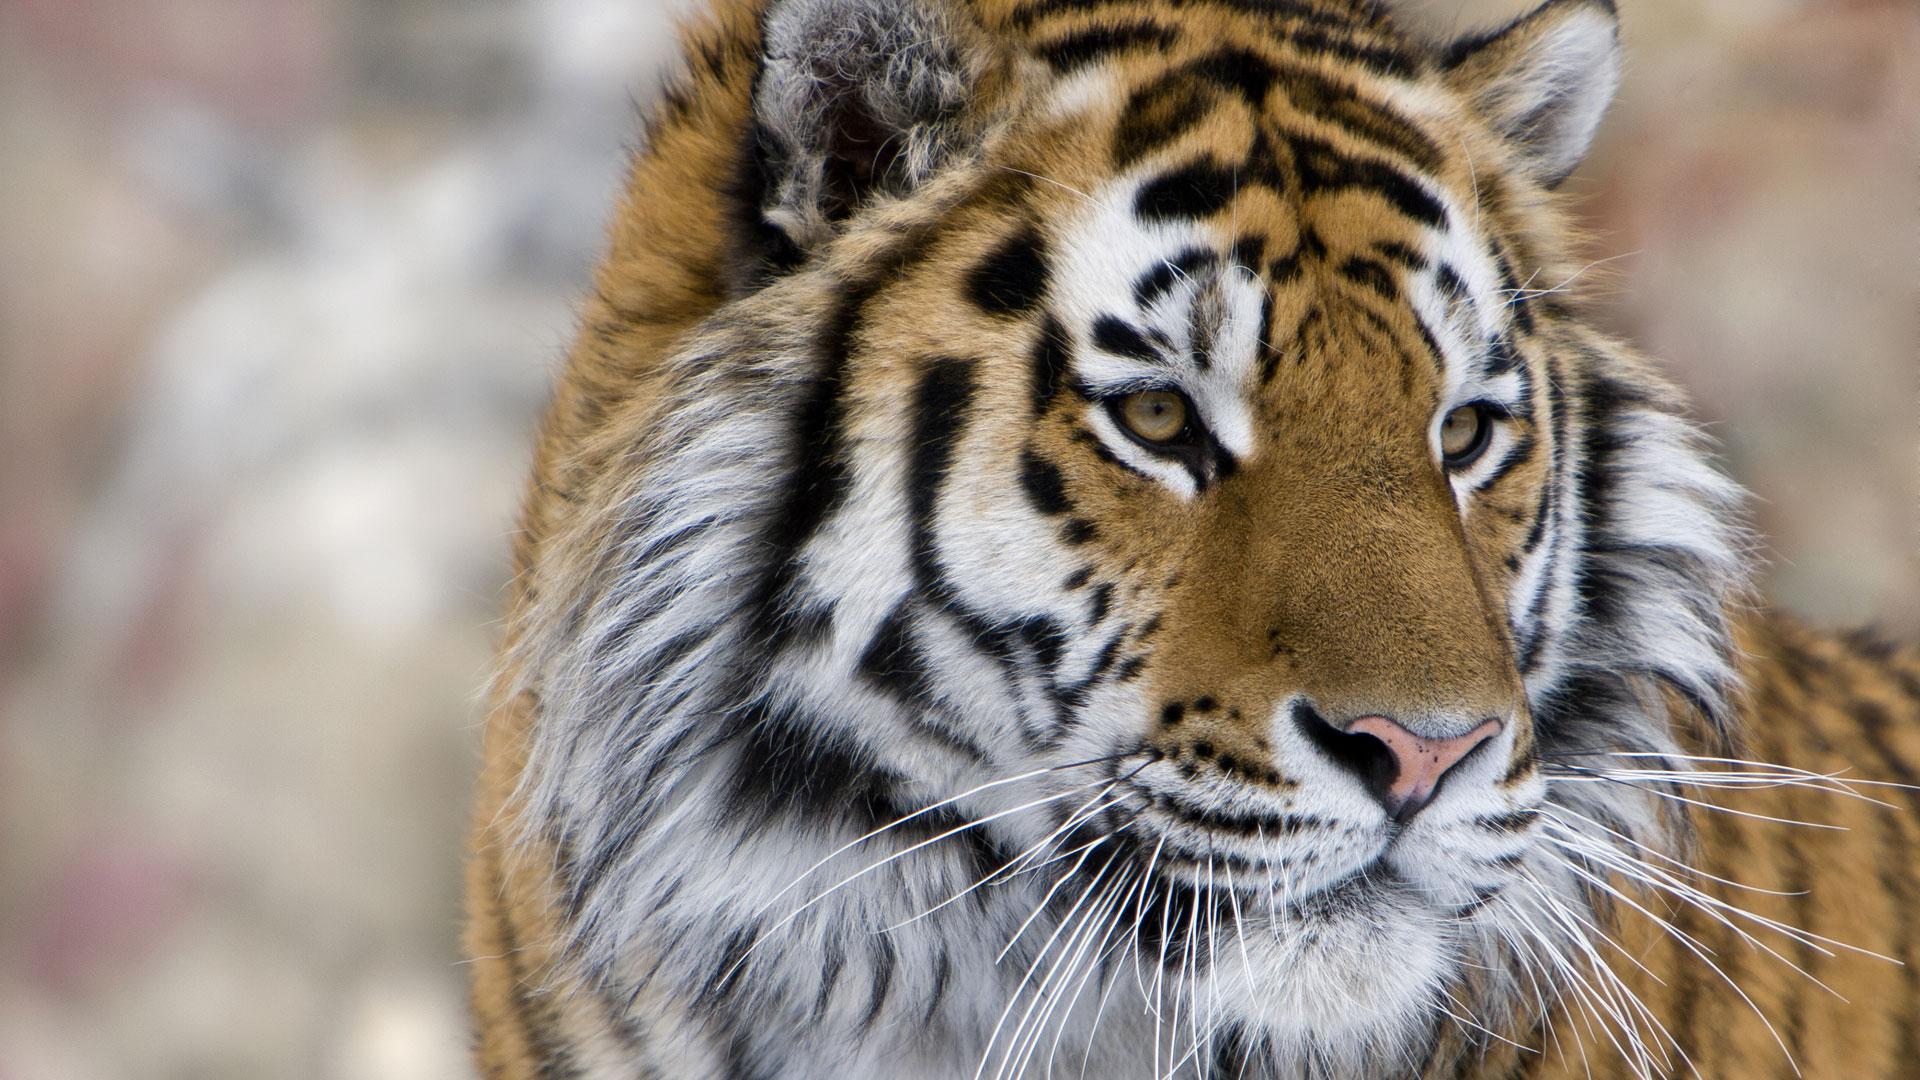 nws-st-siberian-tiger-close